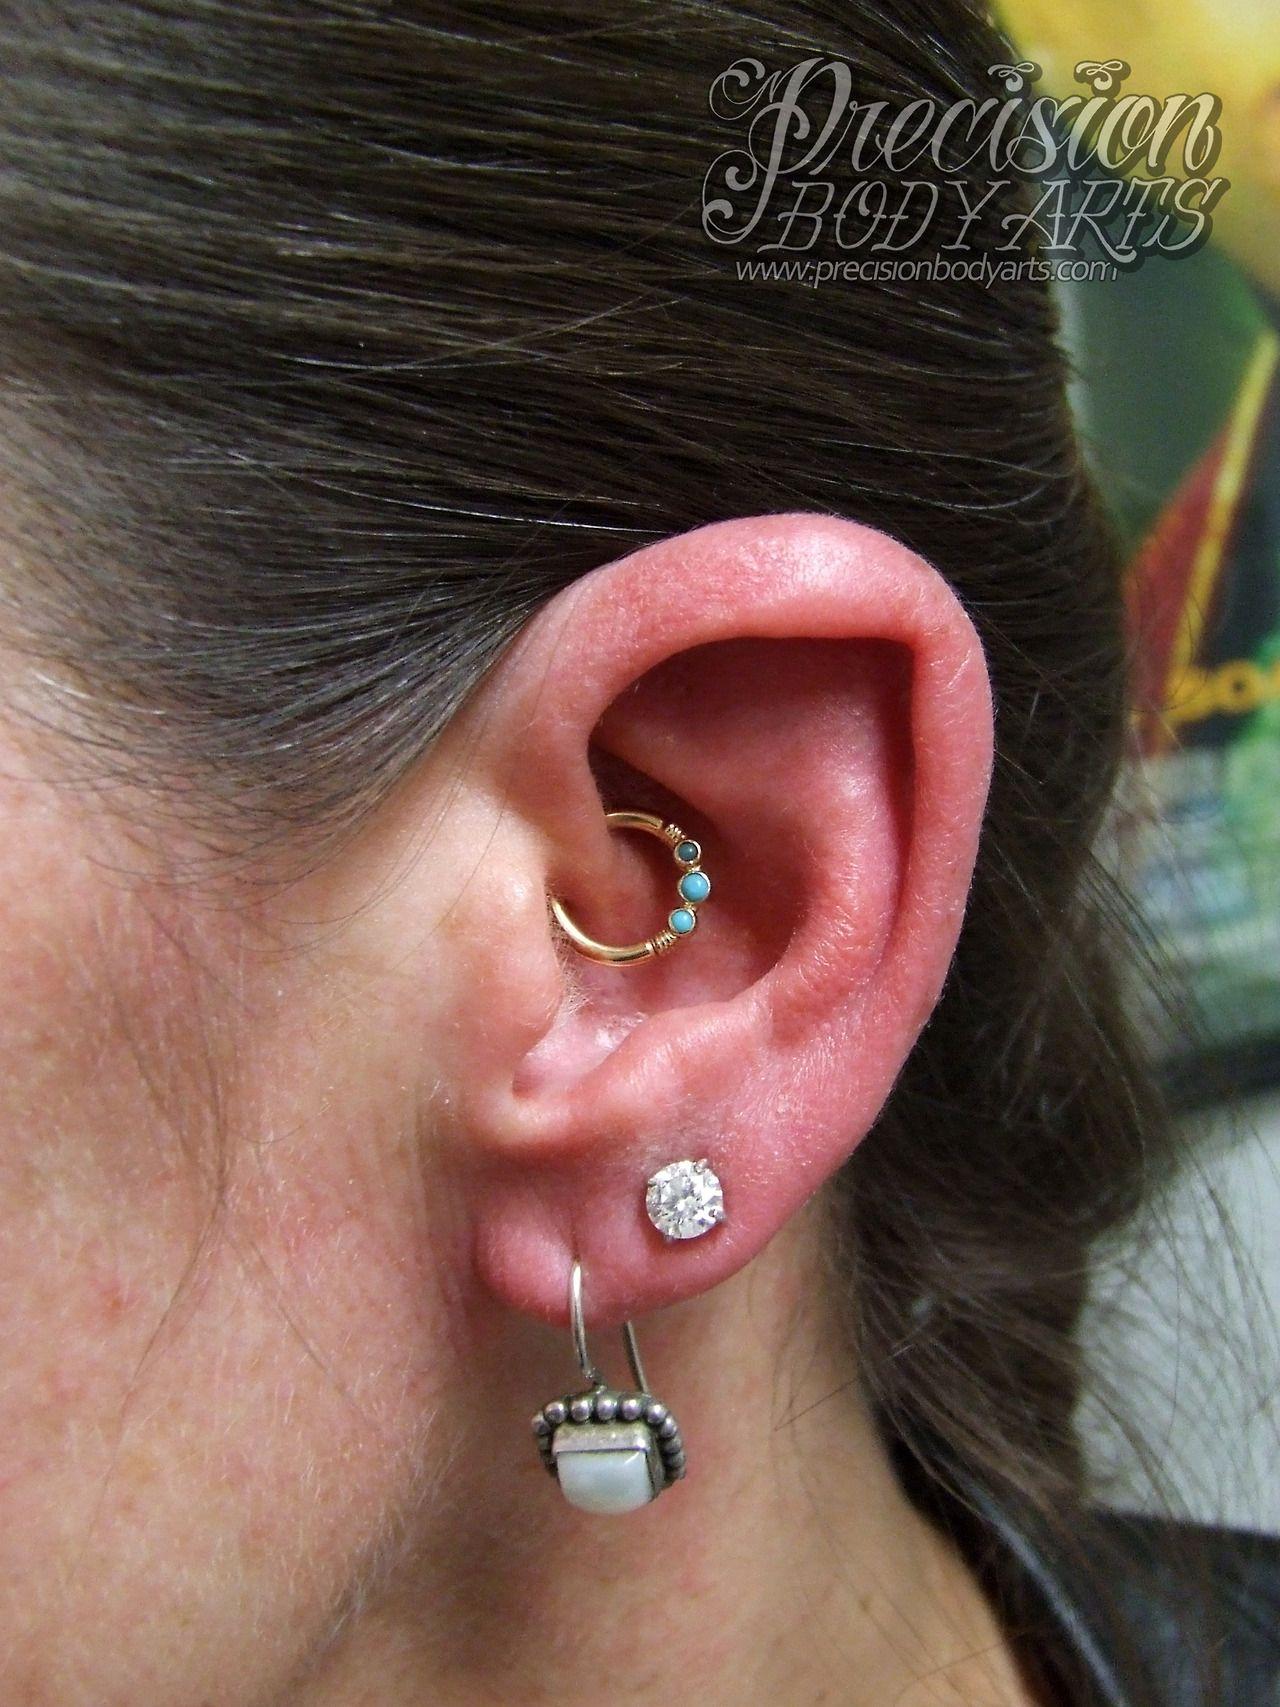 Pin By Lula On Body Piercing Jewelry Body Piercing Jewelry Daith Jewelry Daith Piercing